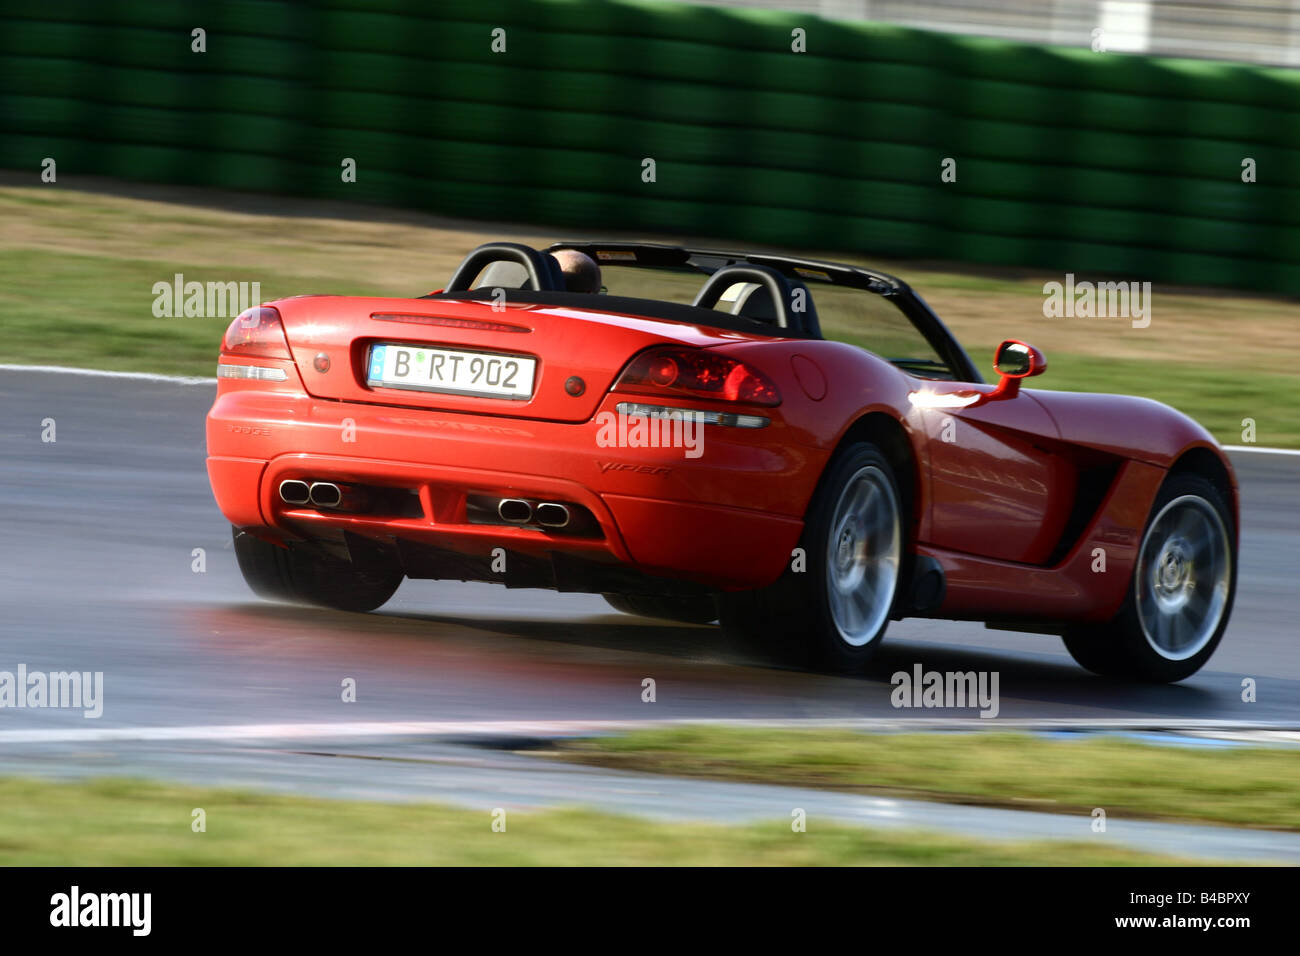 Car dodge viper srt 10 convertible model year 2003 red